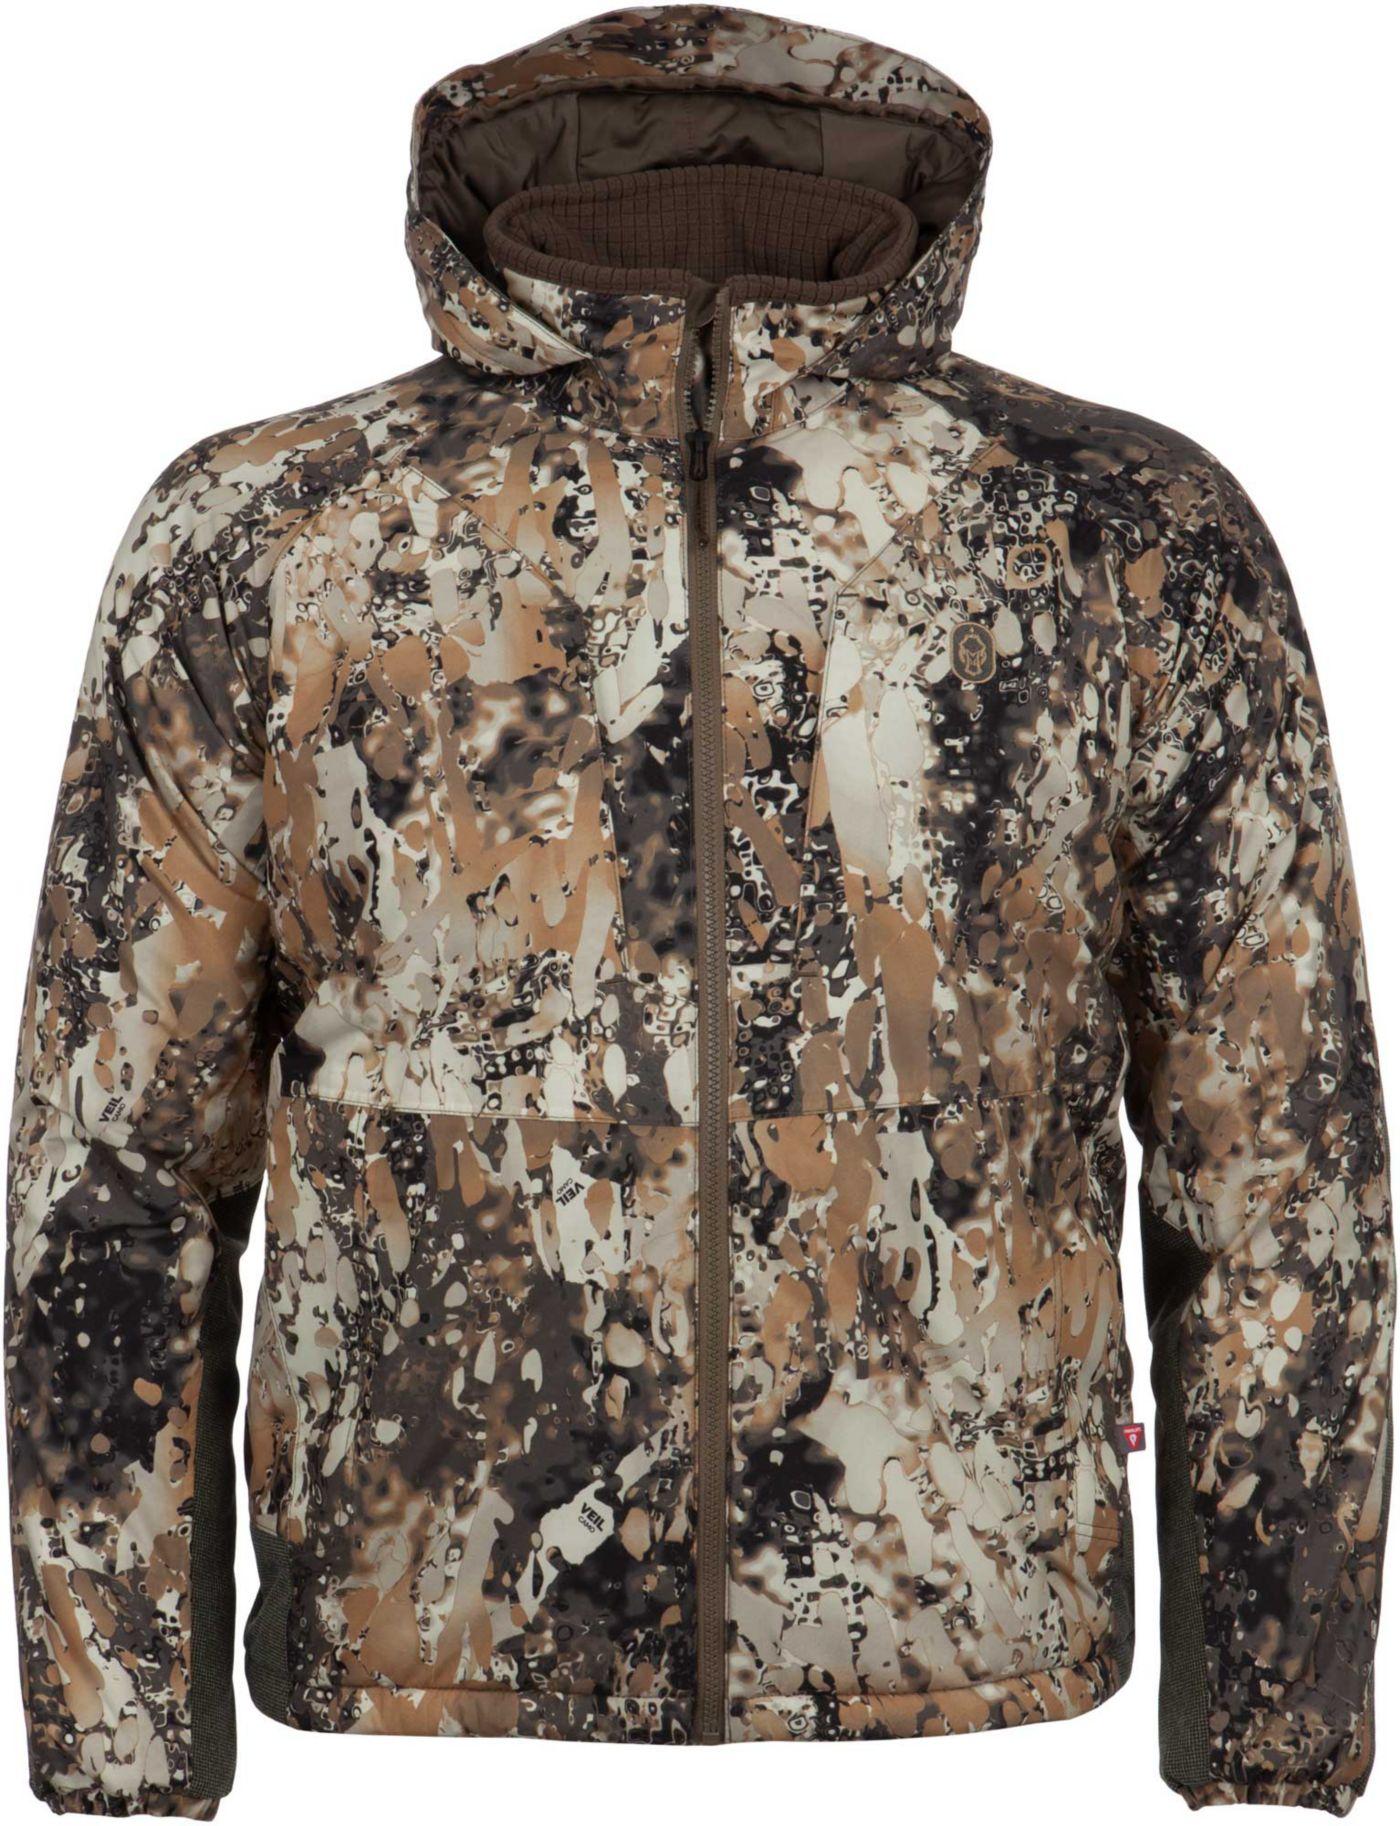 Hardcore Men's Thermal Extreme Hunting Jacket